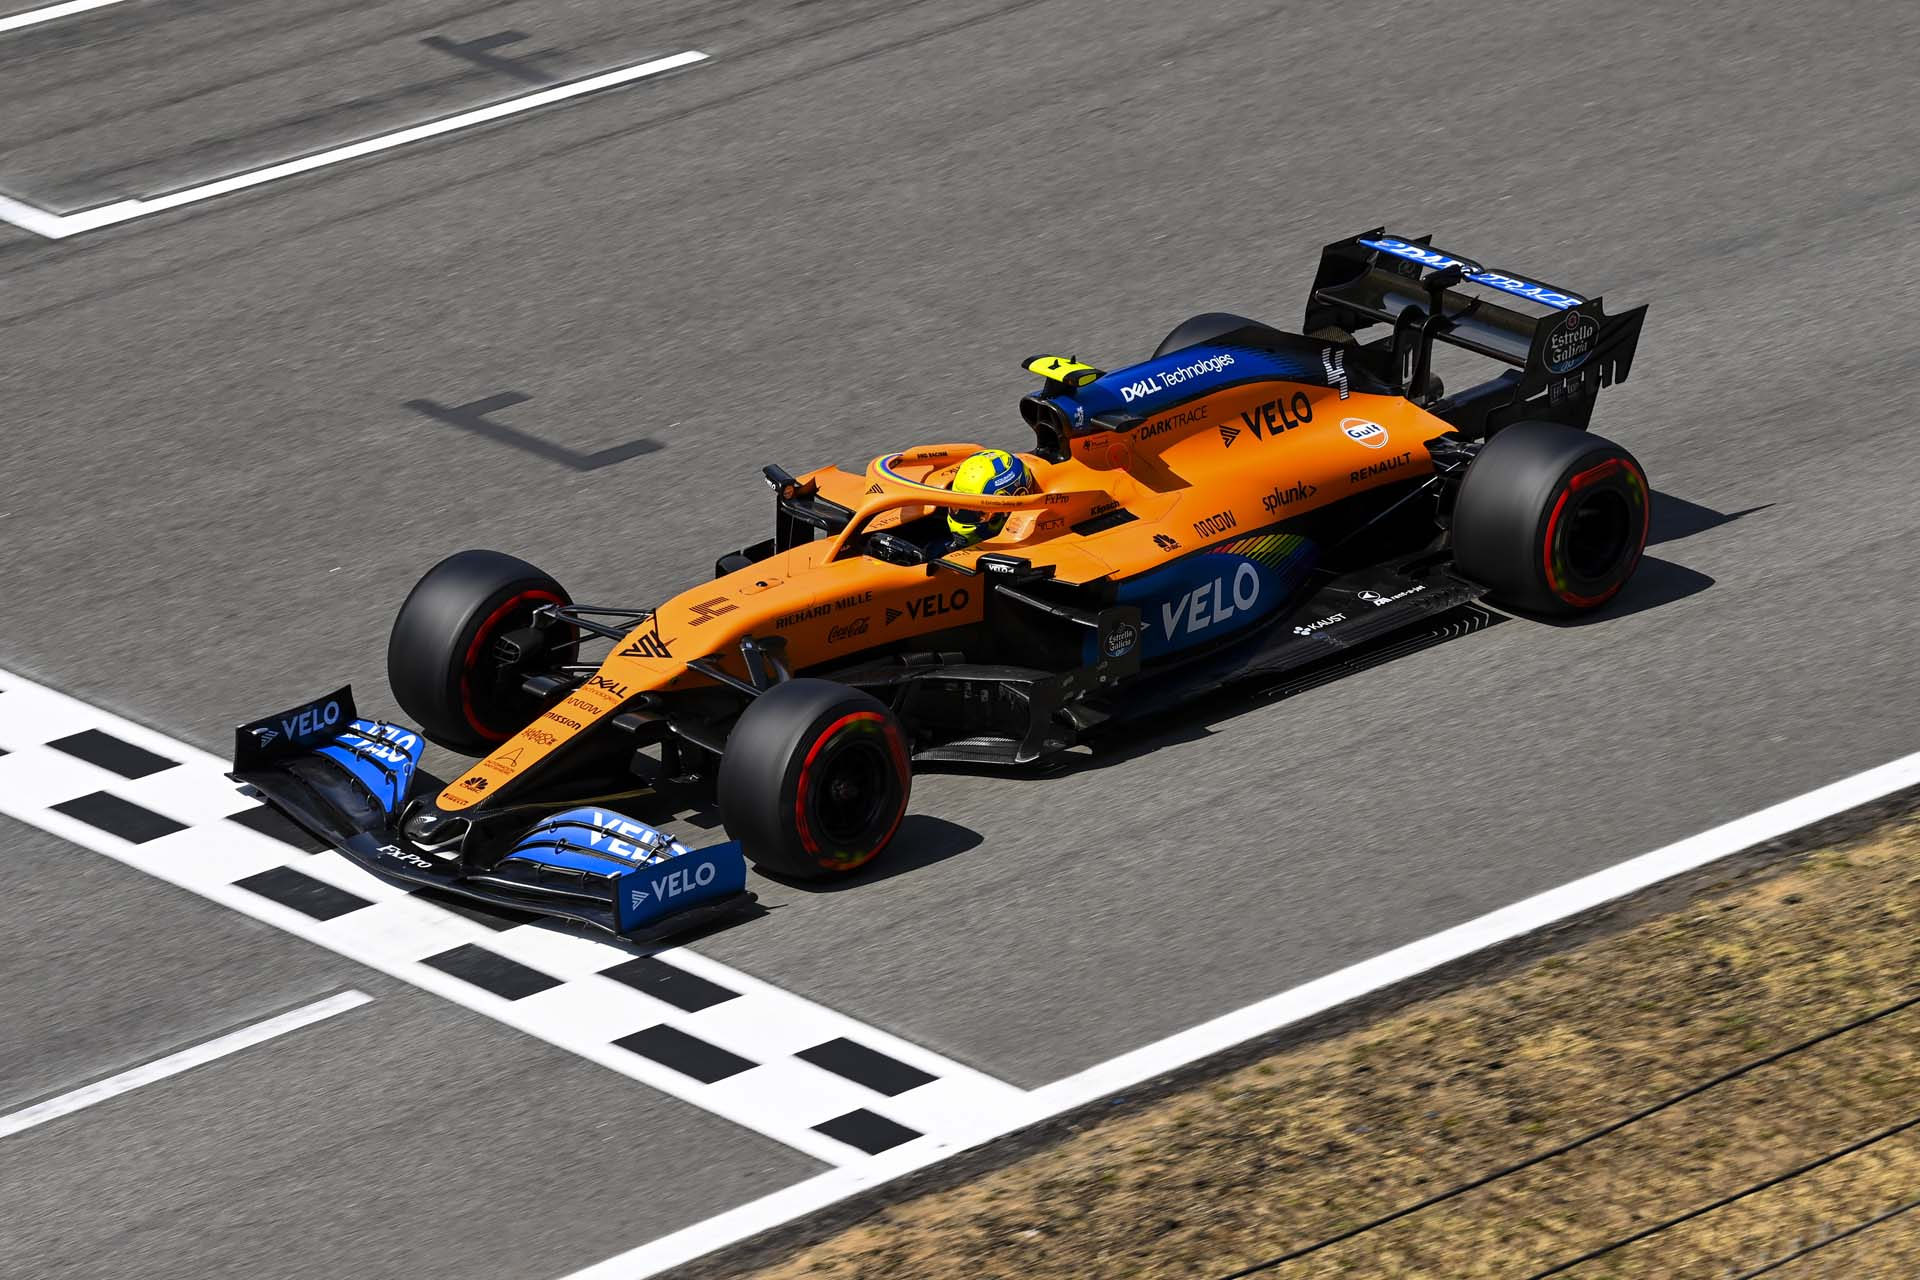 Lando Norris, McLaren MCL35, on the pit straight